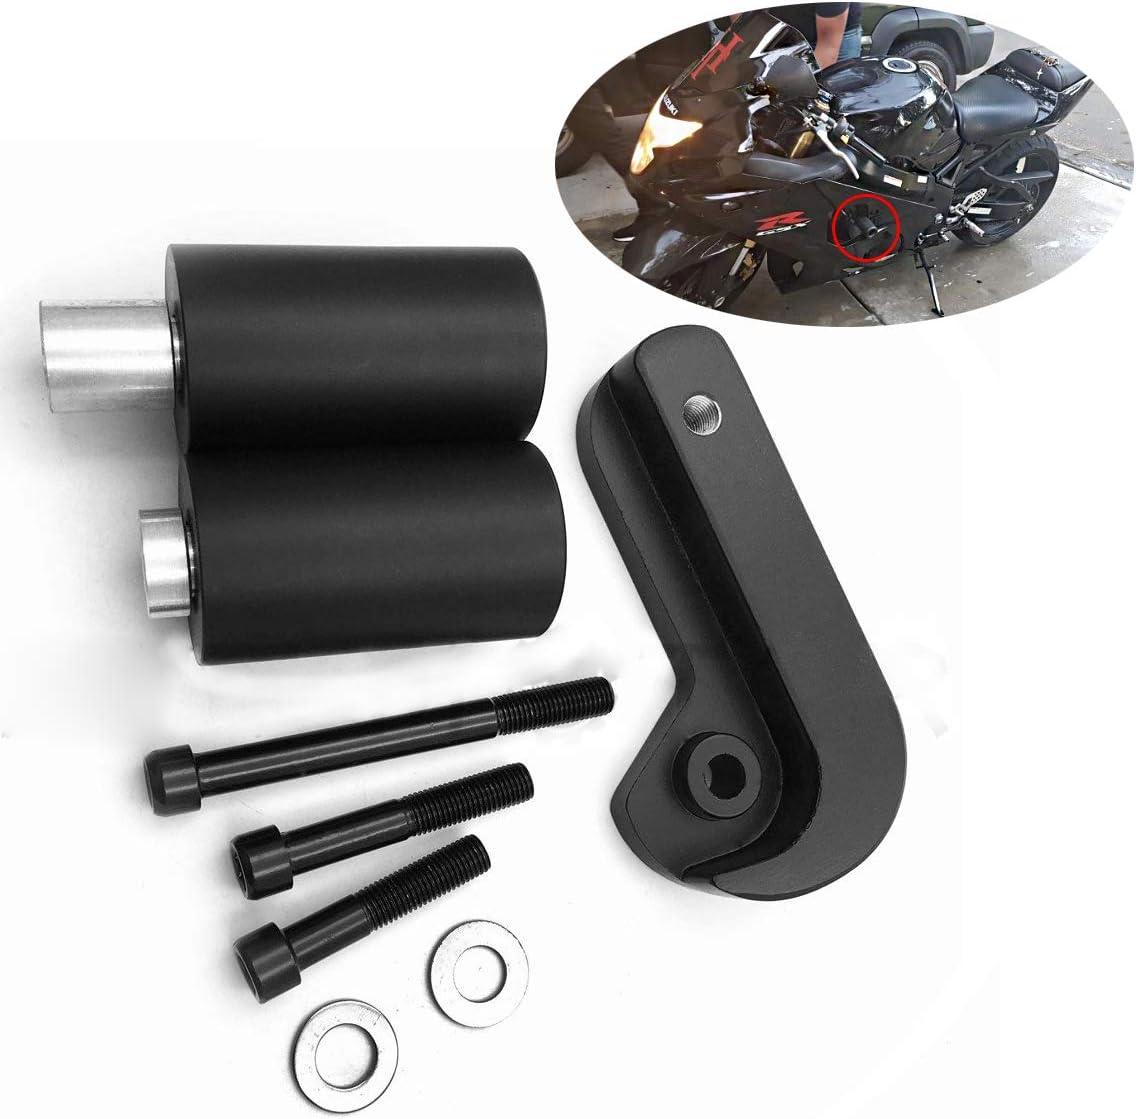 B00YWCU8J0 XKMT-No Cut Frame Slider Crash Protector Compatible With 2005 2006 Suzuki Gsxr 1000 Gsx-R Black